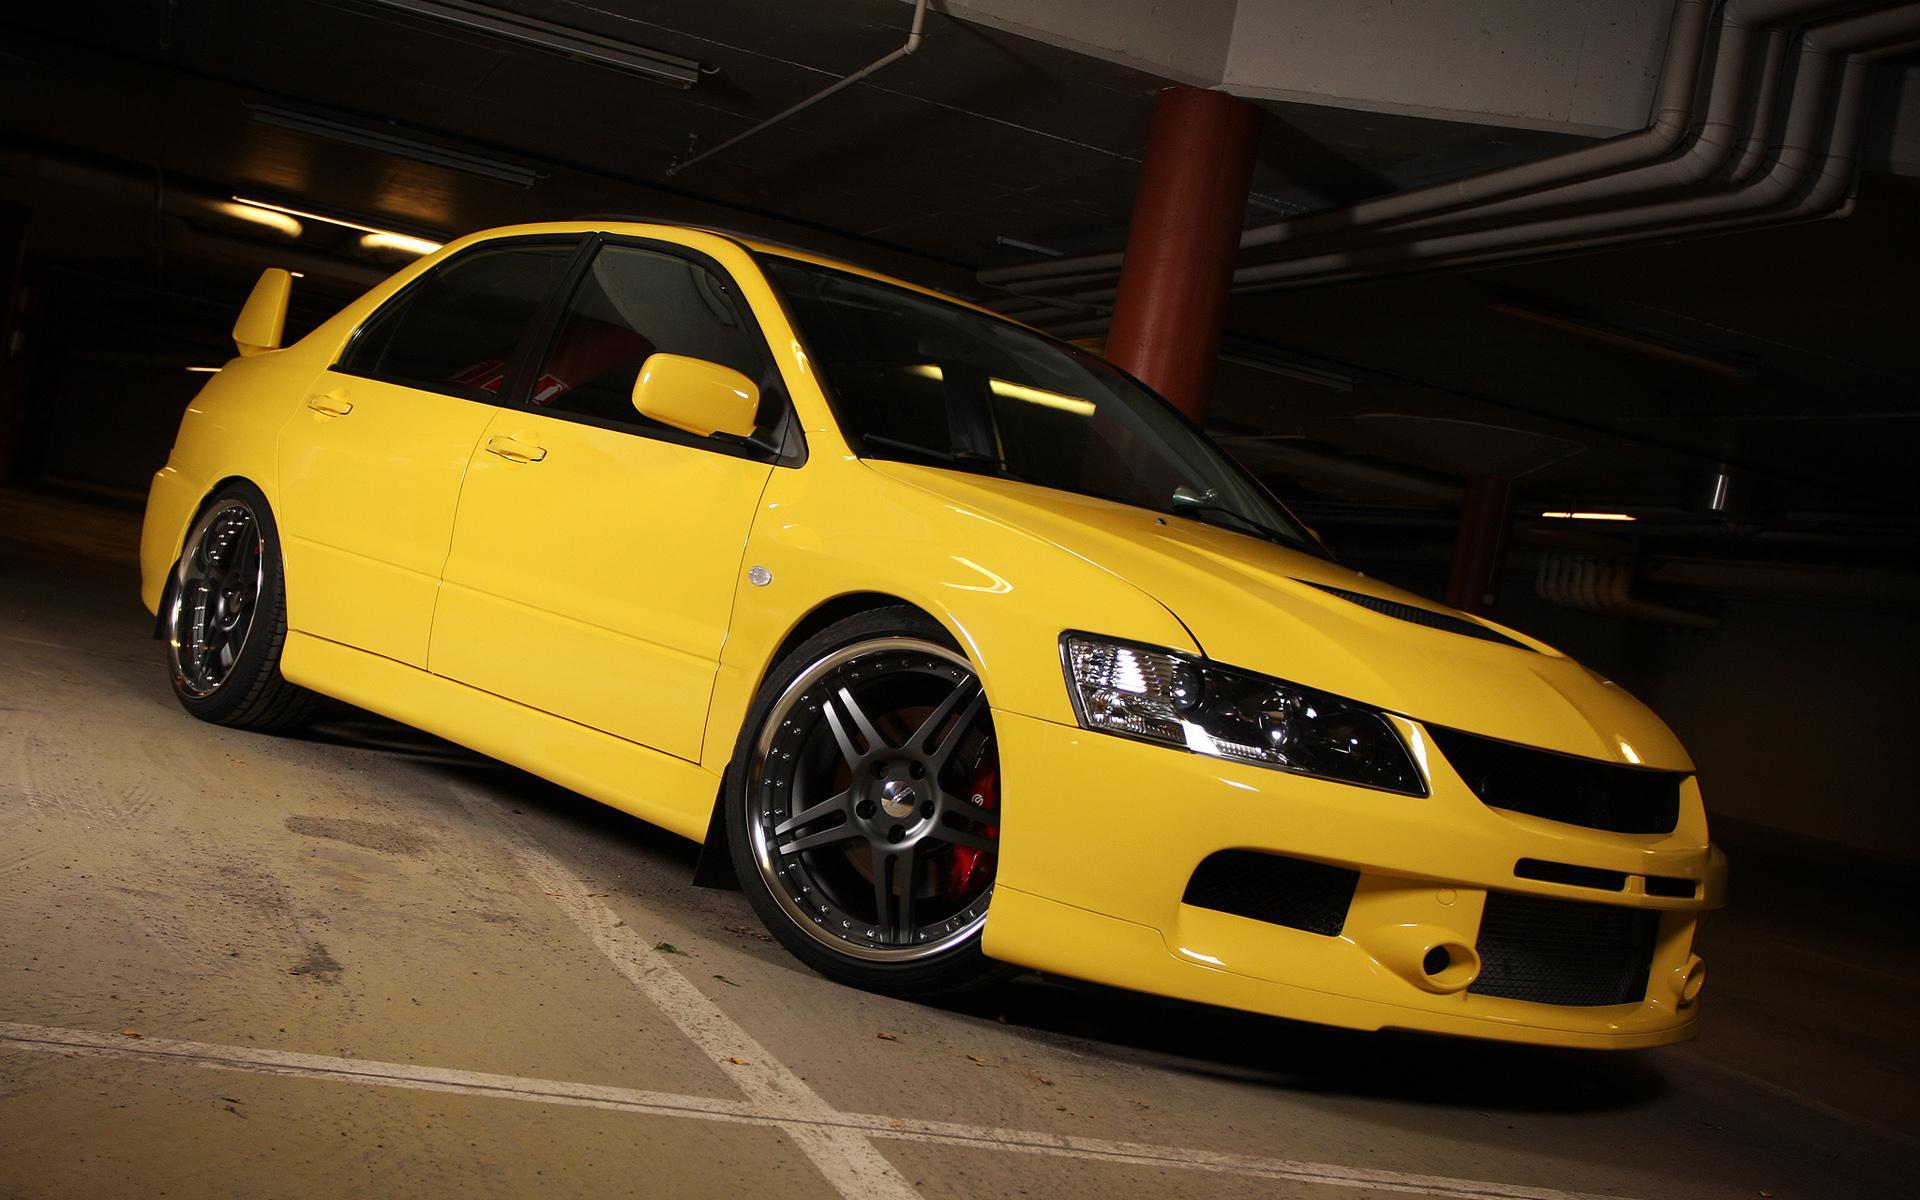 Желтая машина фото 1